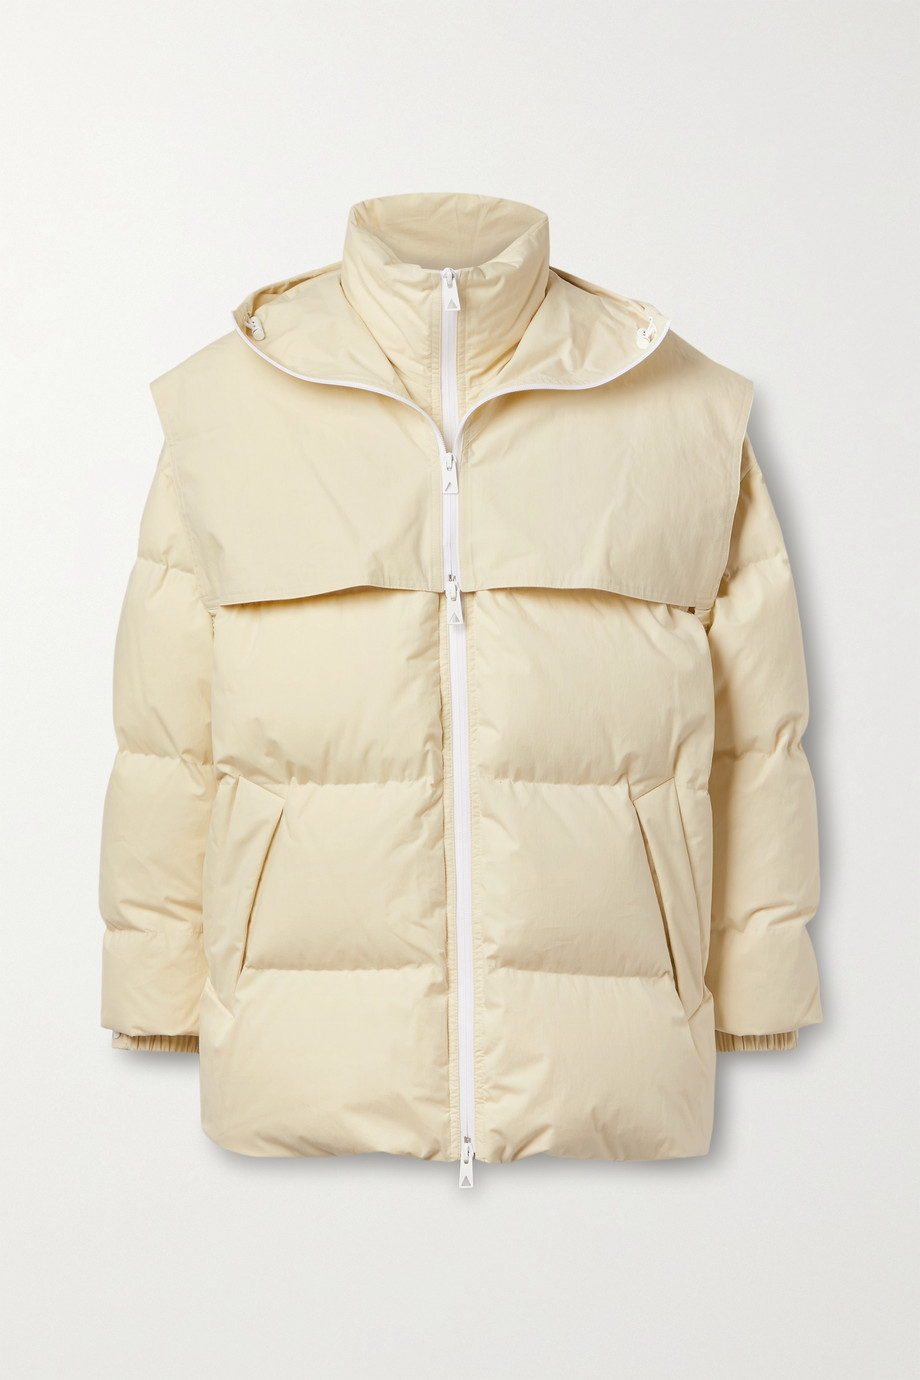 Bottega Veneta Hooded quilted cotton down jacket